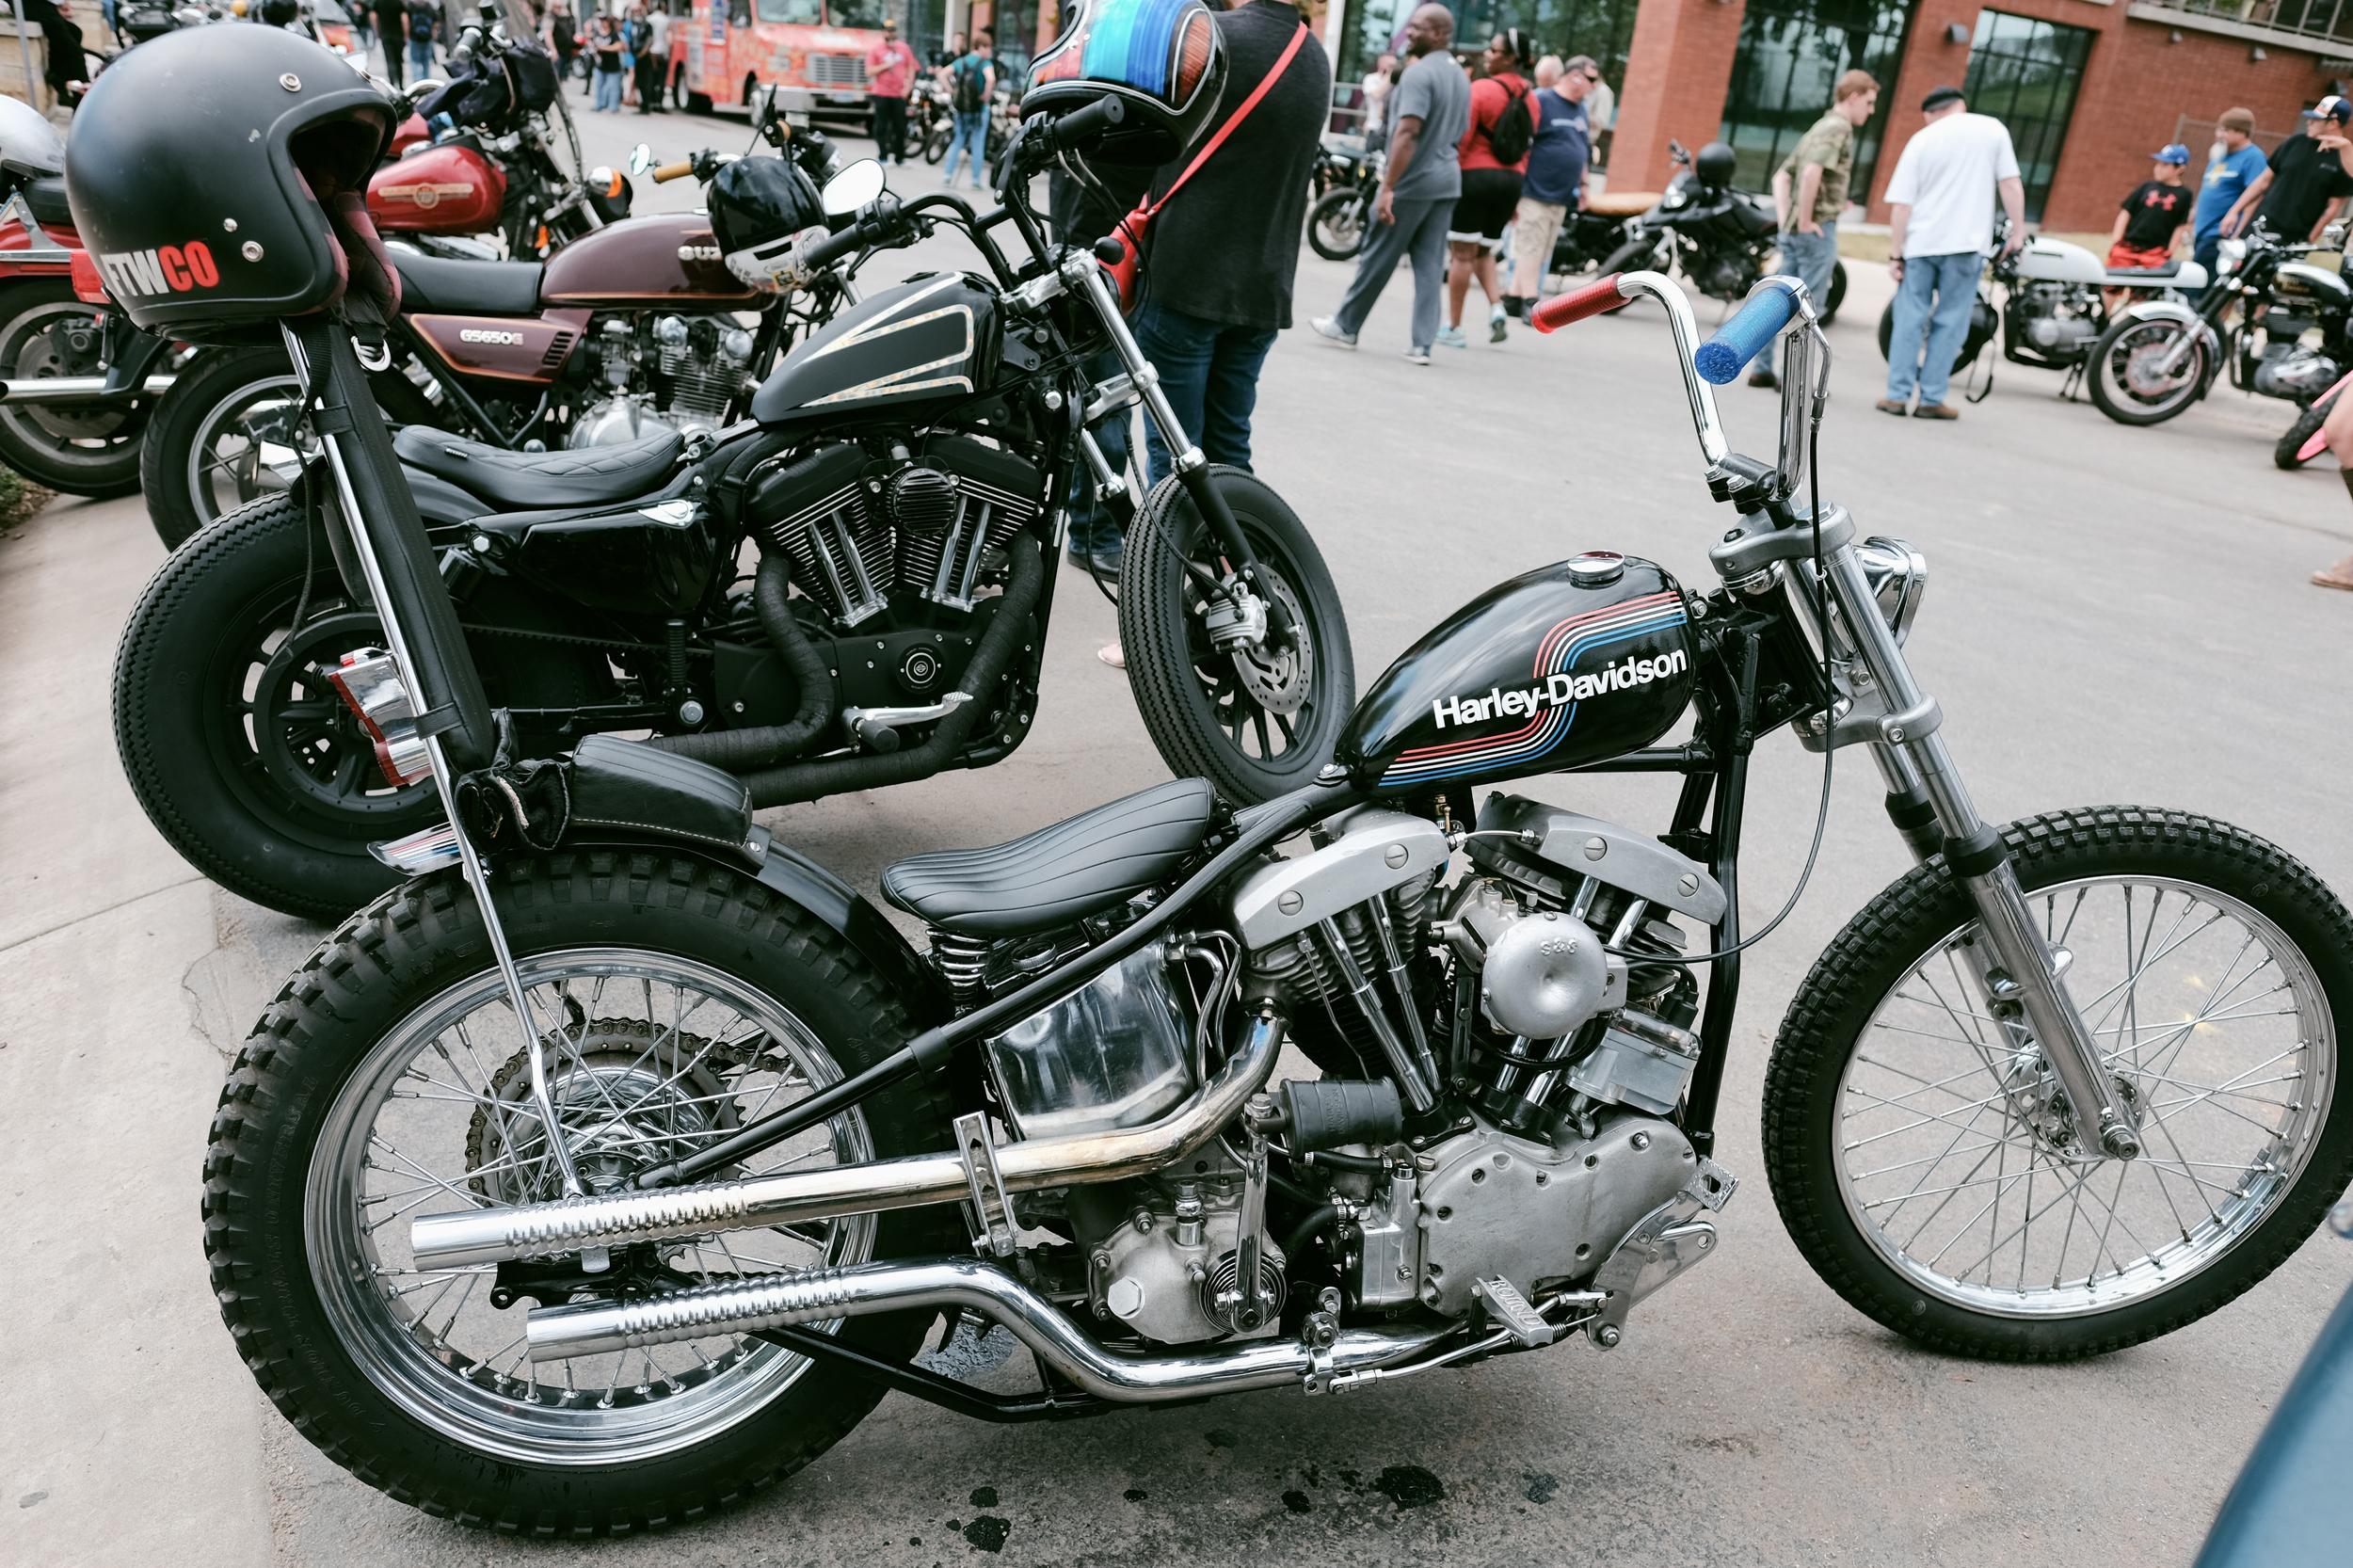 handbuilt-motorcycle-show-2016-9116.jpg